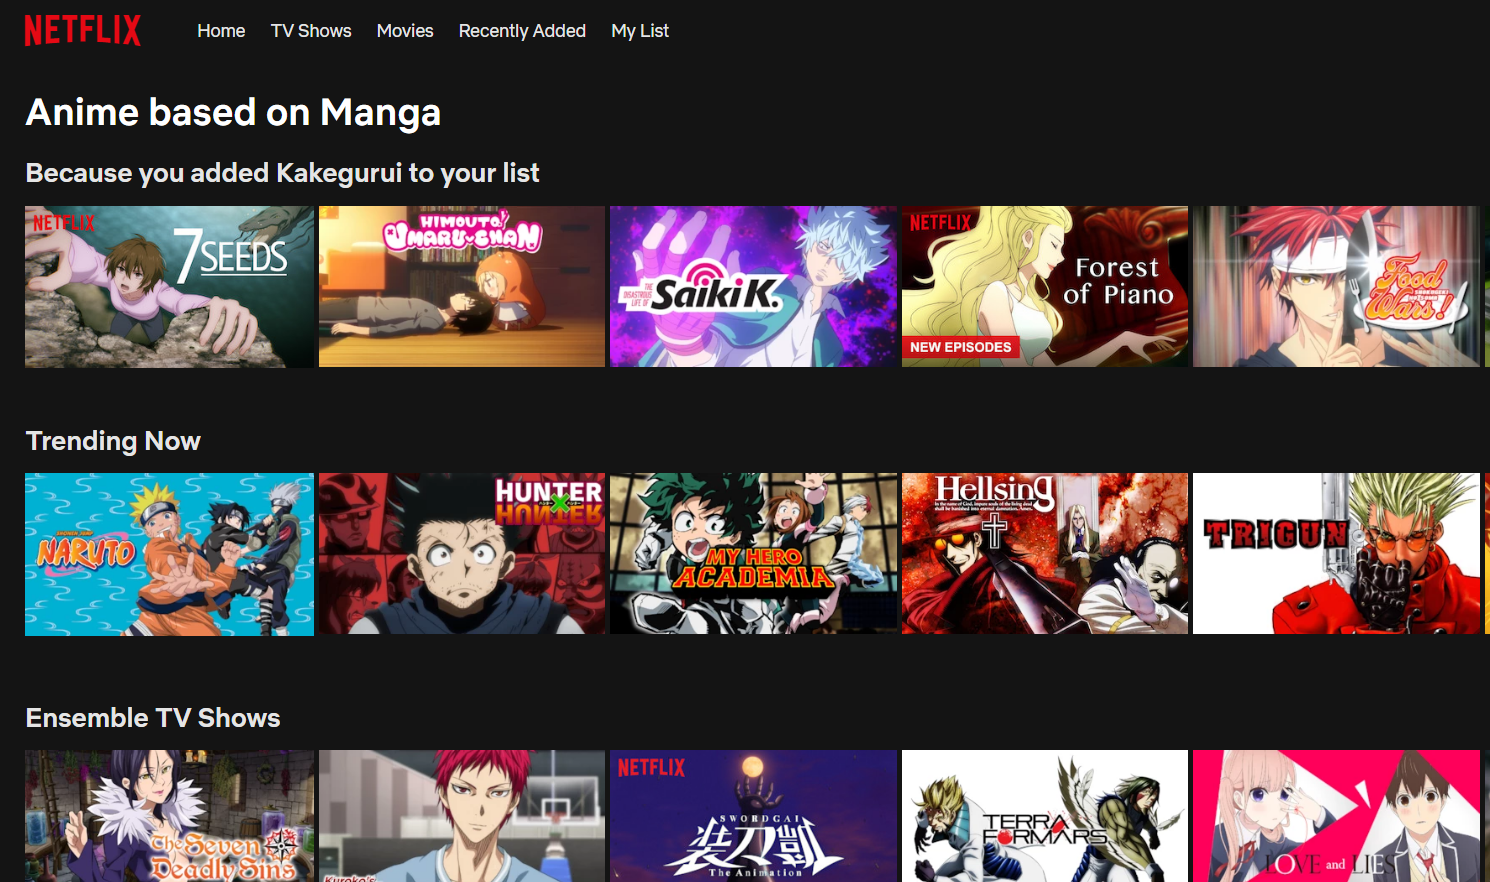 8 Animes that Make Netflix Worth it